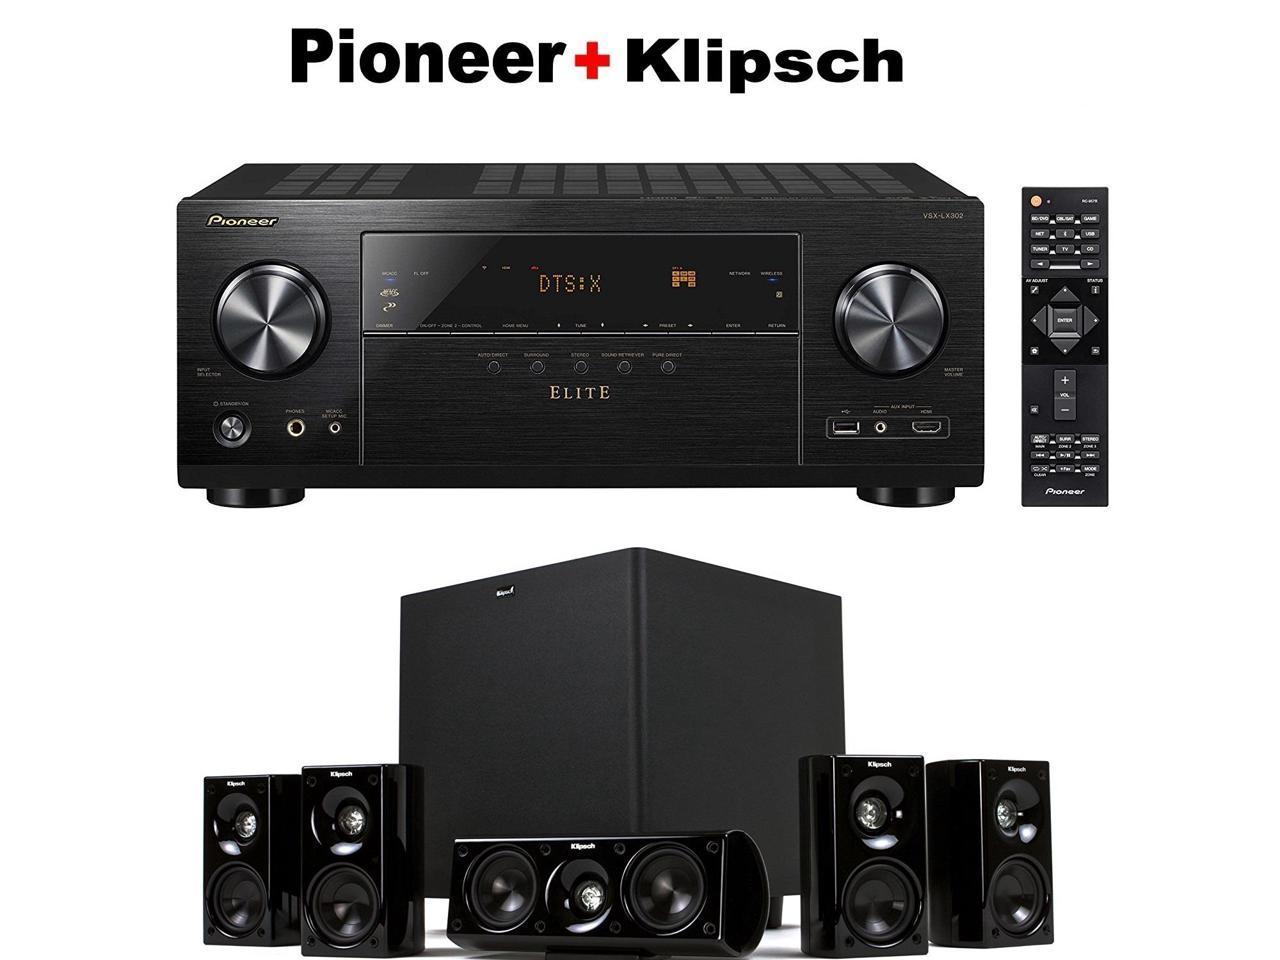 Pioneer VSX-LX302 receiver + Klipsch HD Theater 600 home theater speaker system bundle